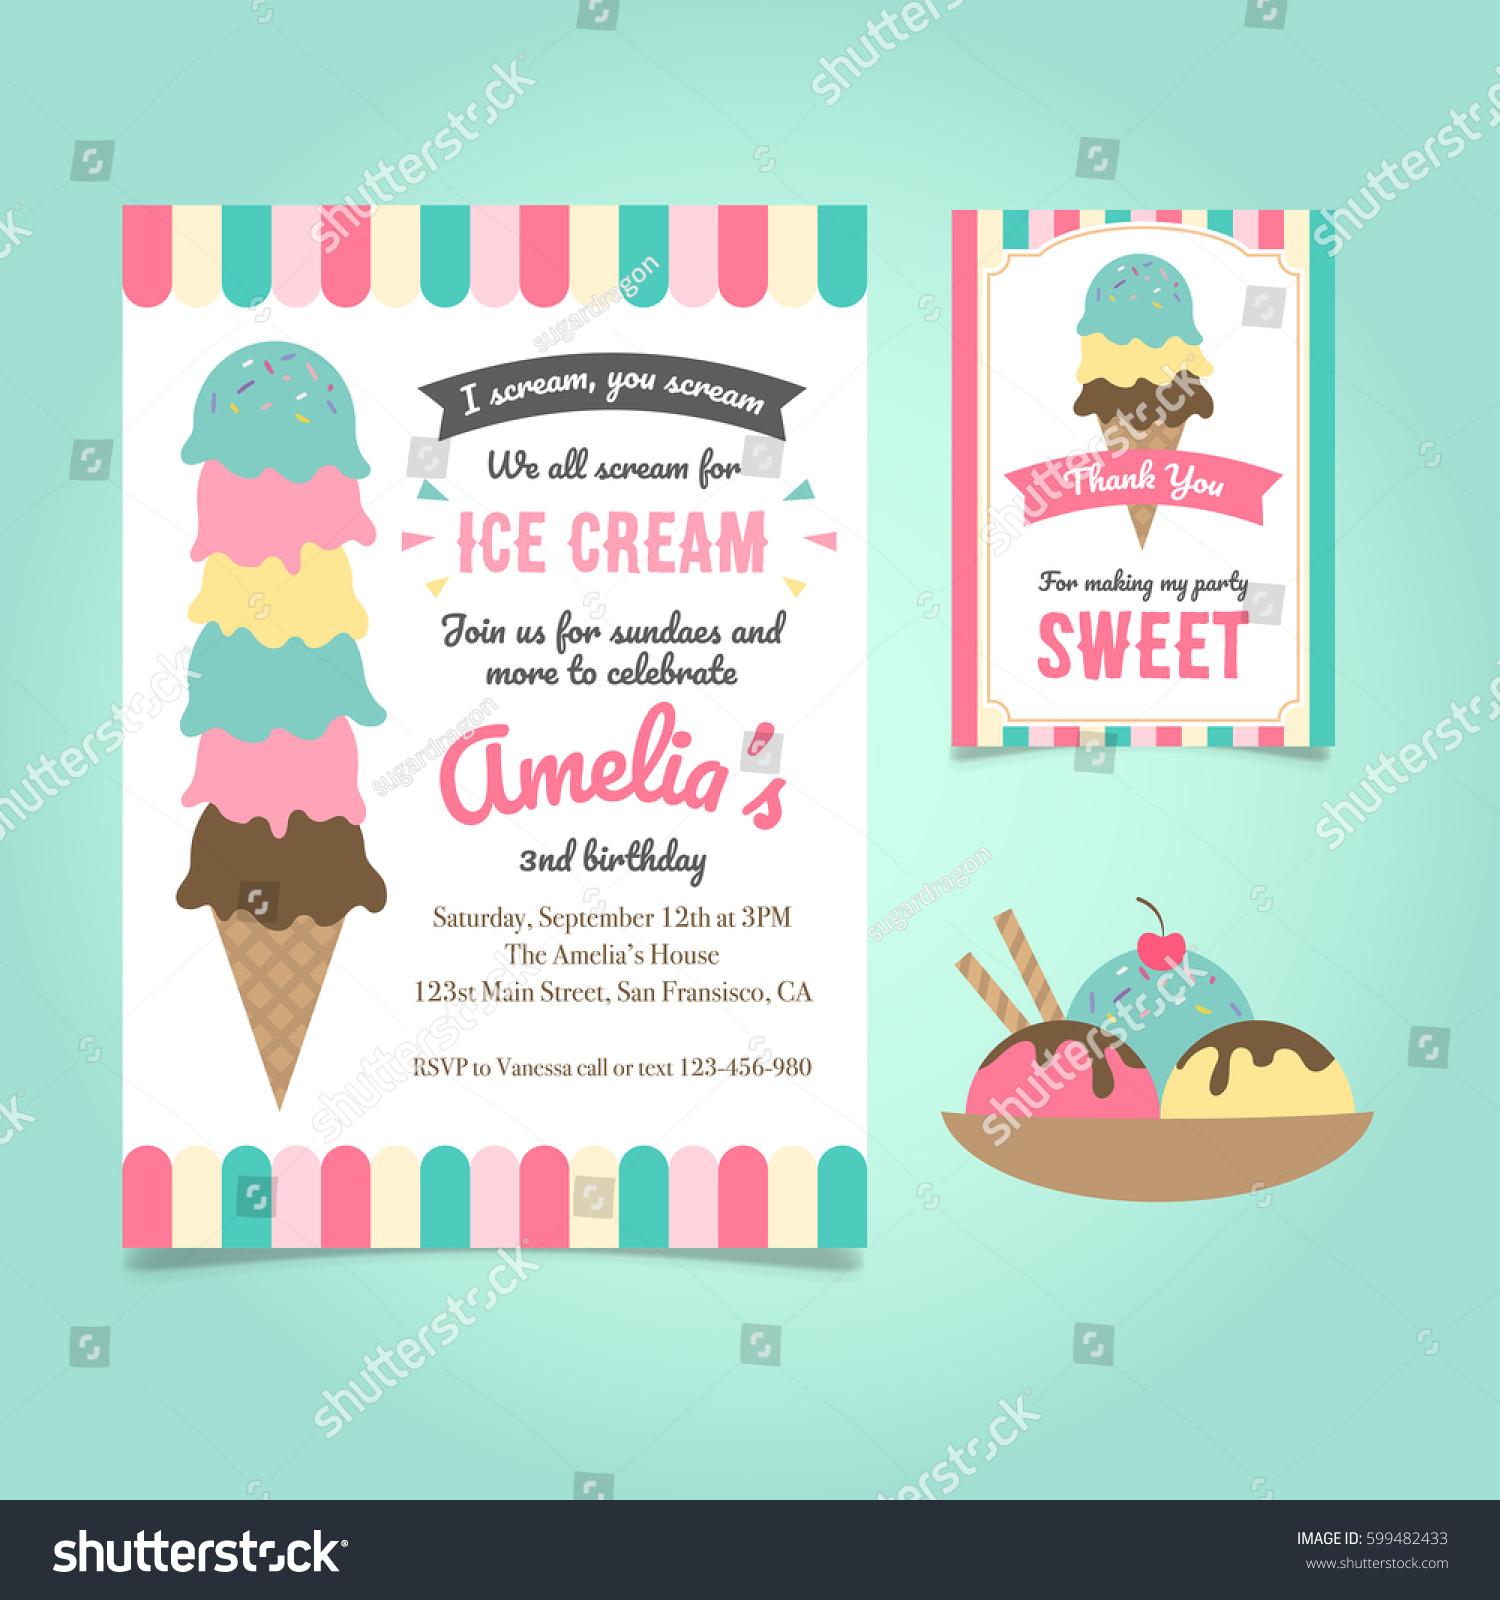 Ice Cream Party Birthday Invitation Template Stock Vector - Dessert party invitation template